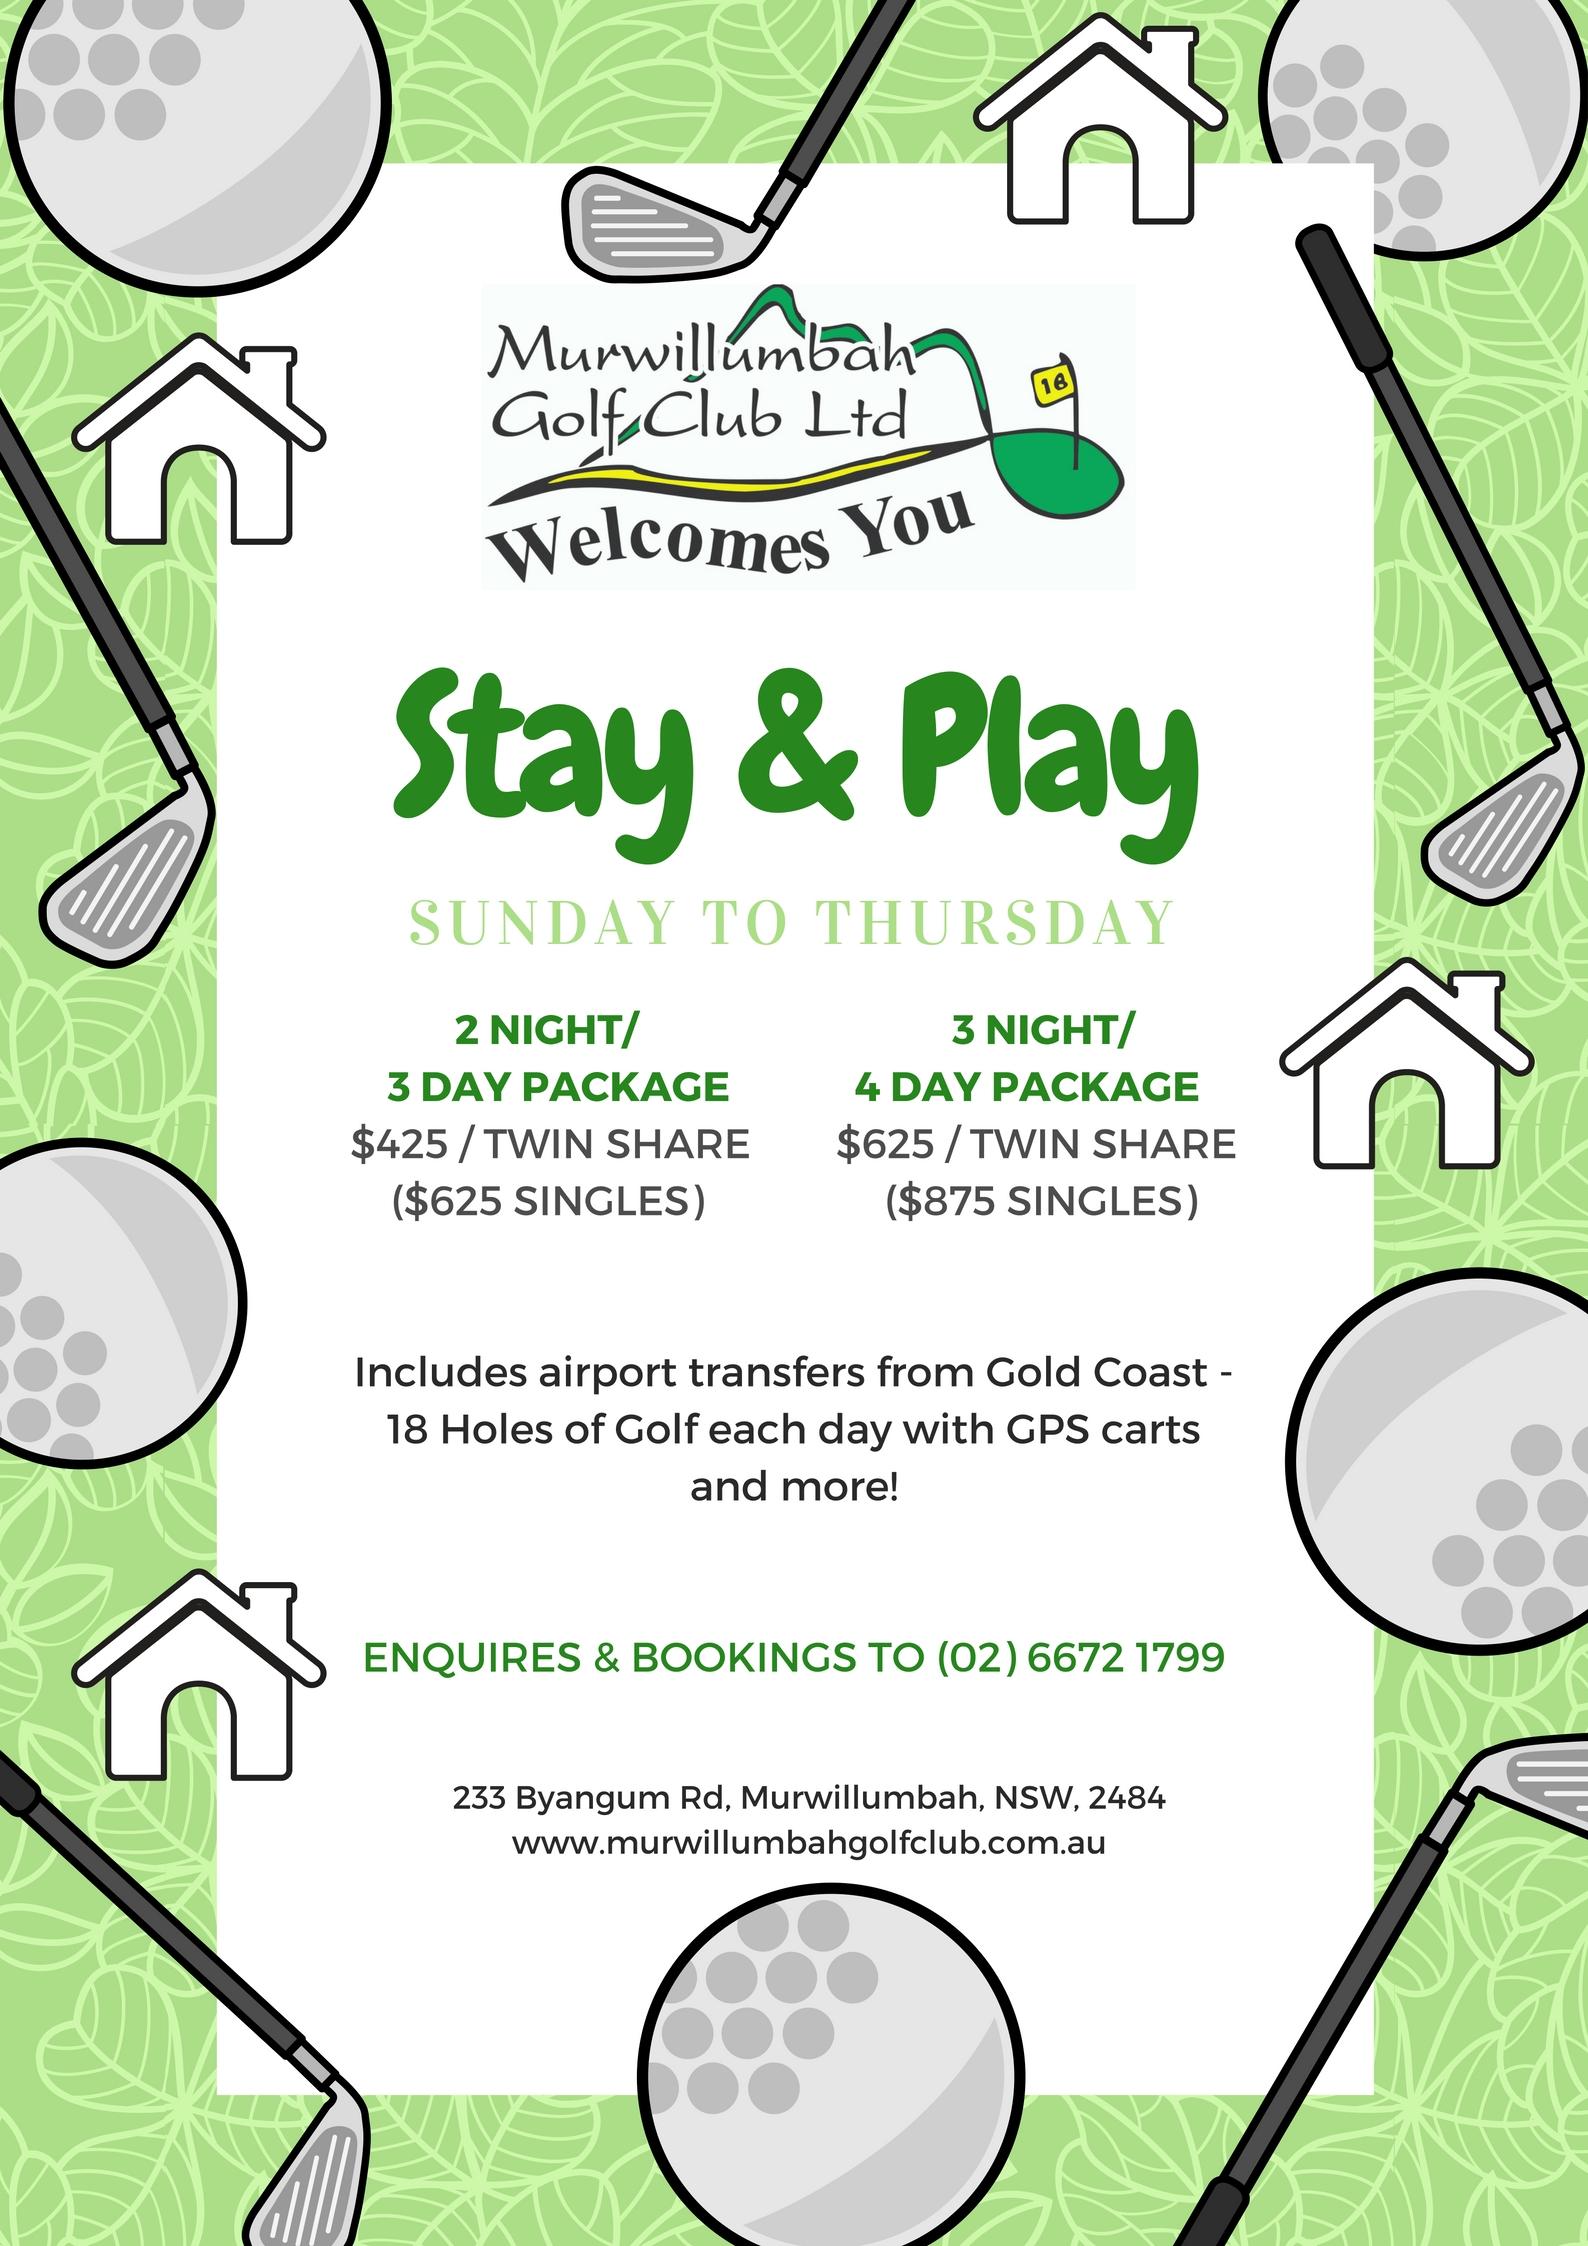 Murwillumbah Golf Club - Play Golf